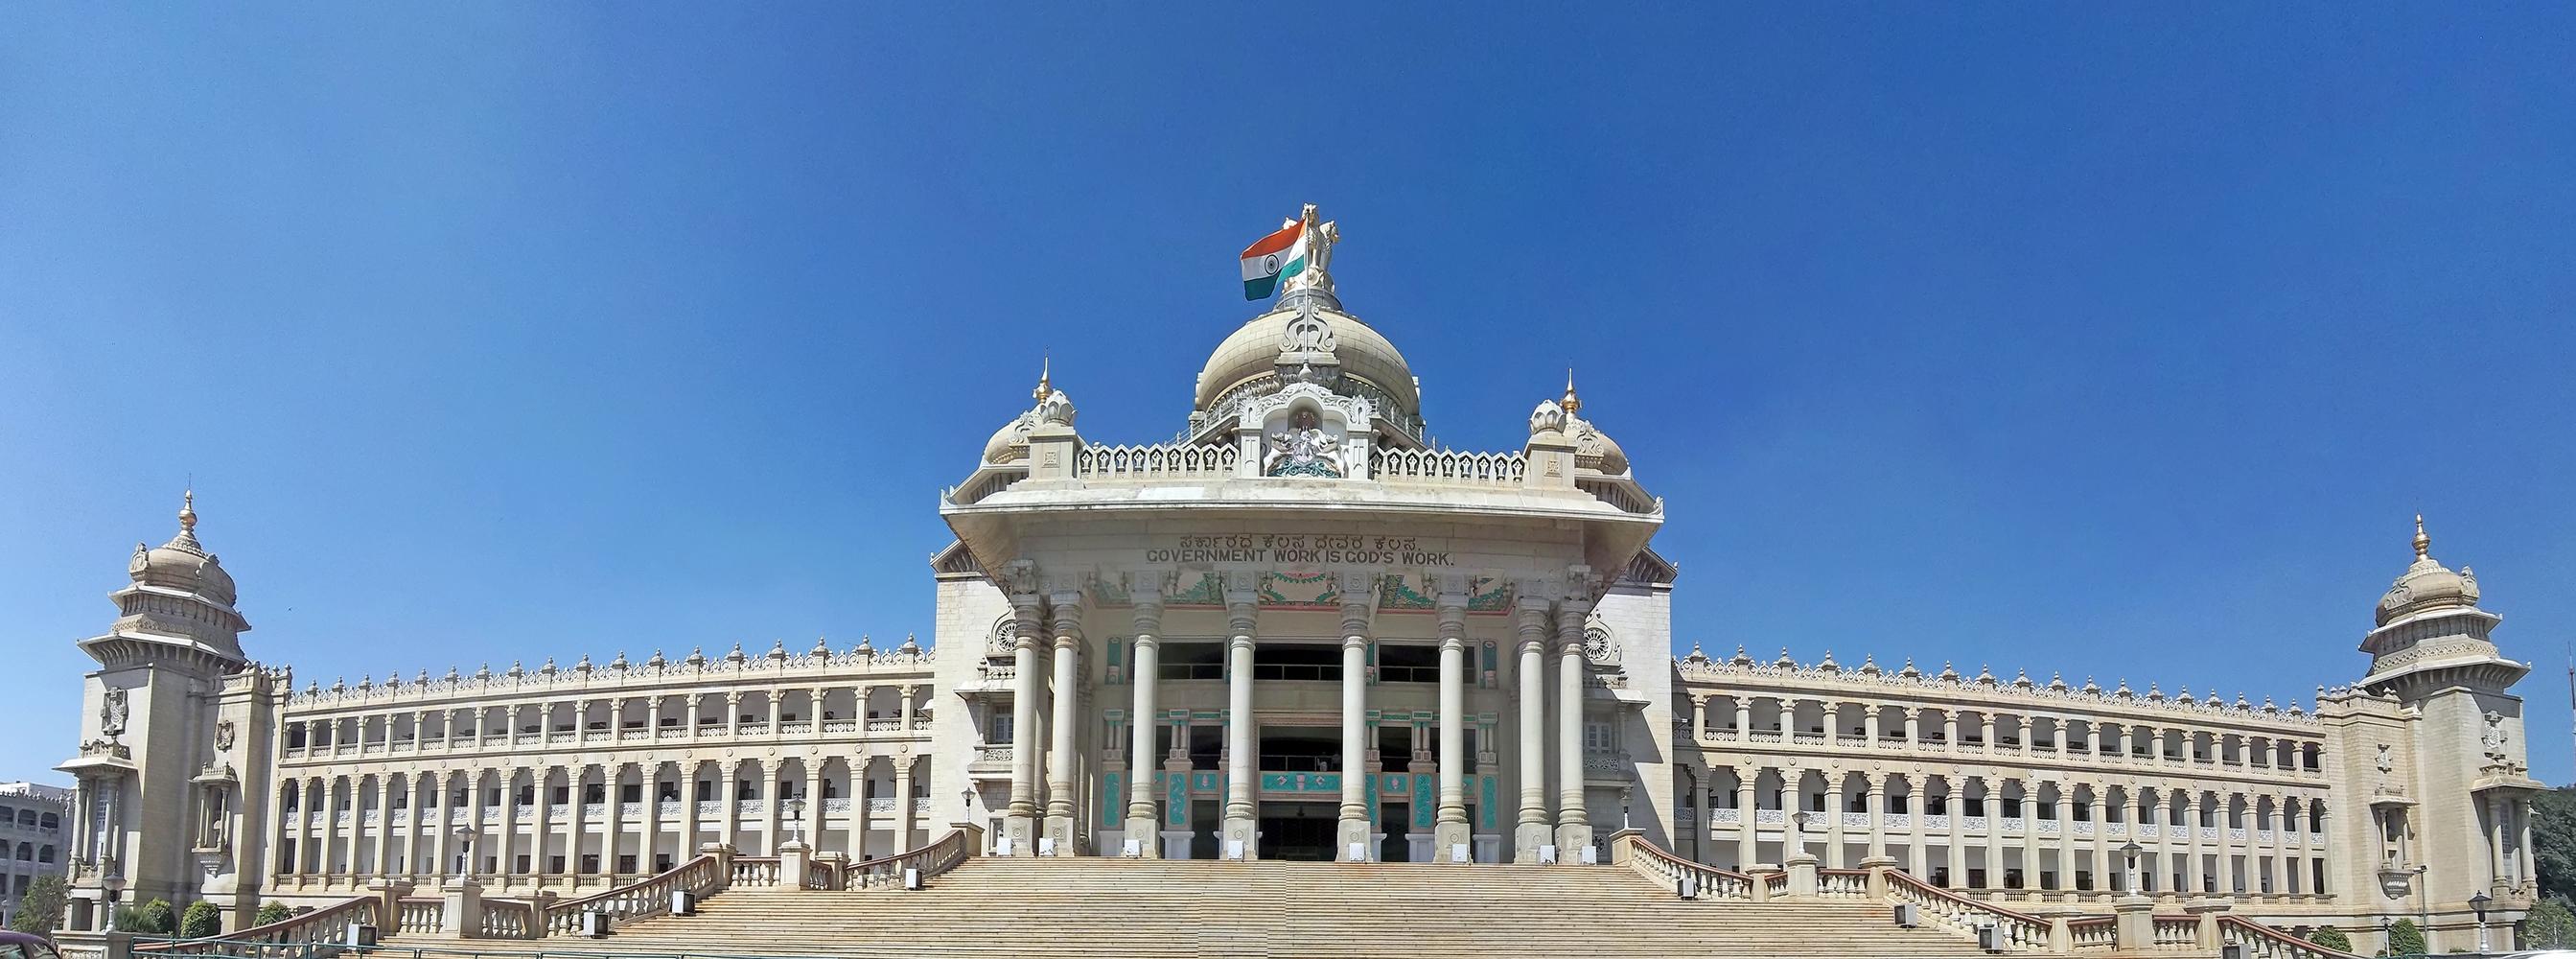 Legislative Assembly Building Legislative Assembly Chamber